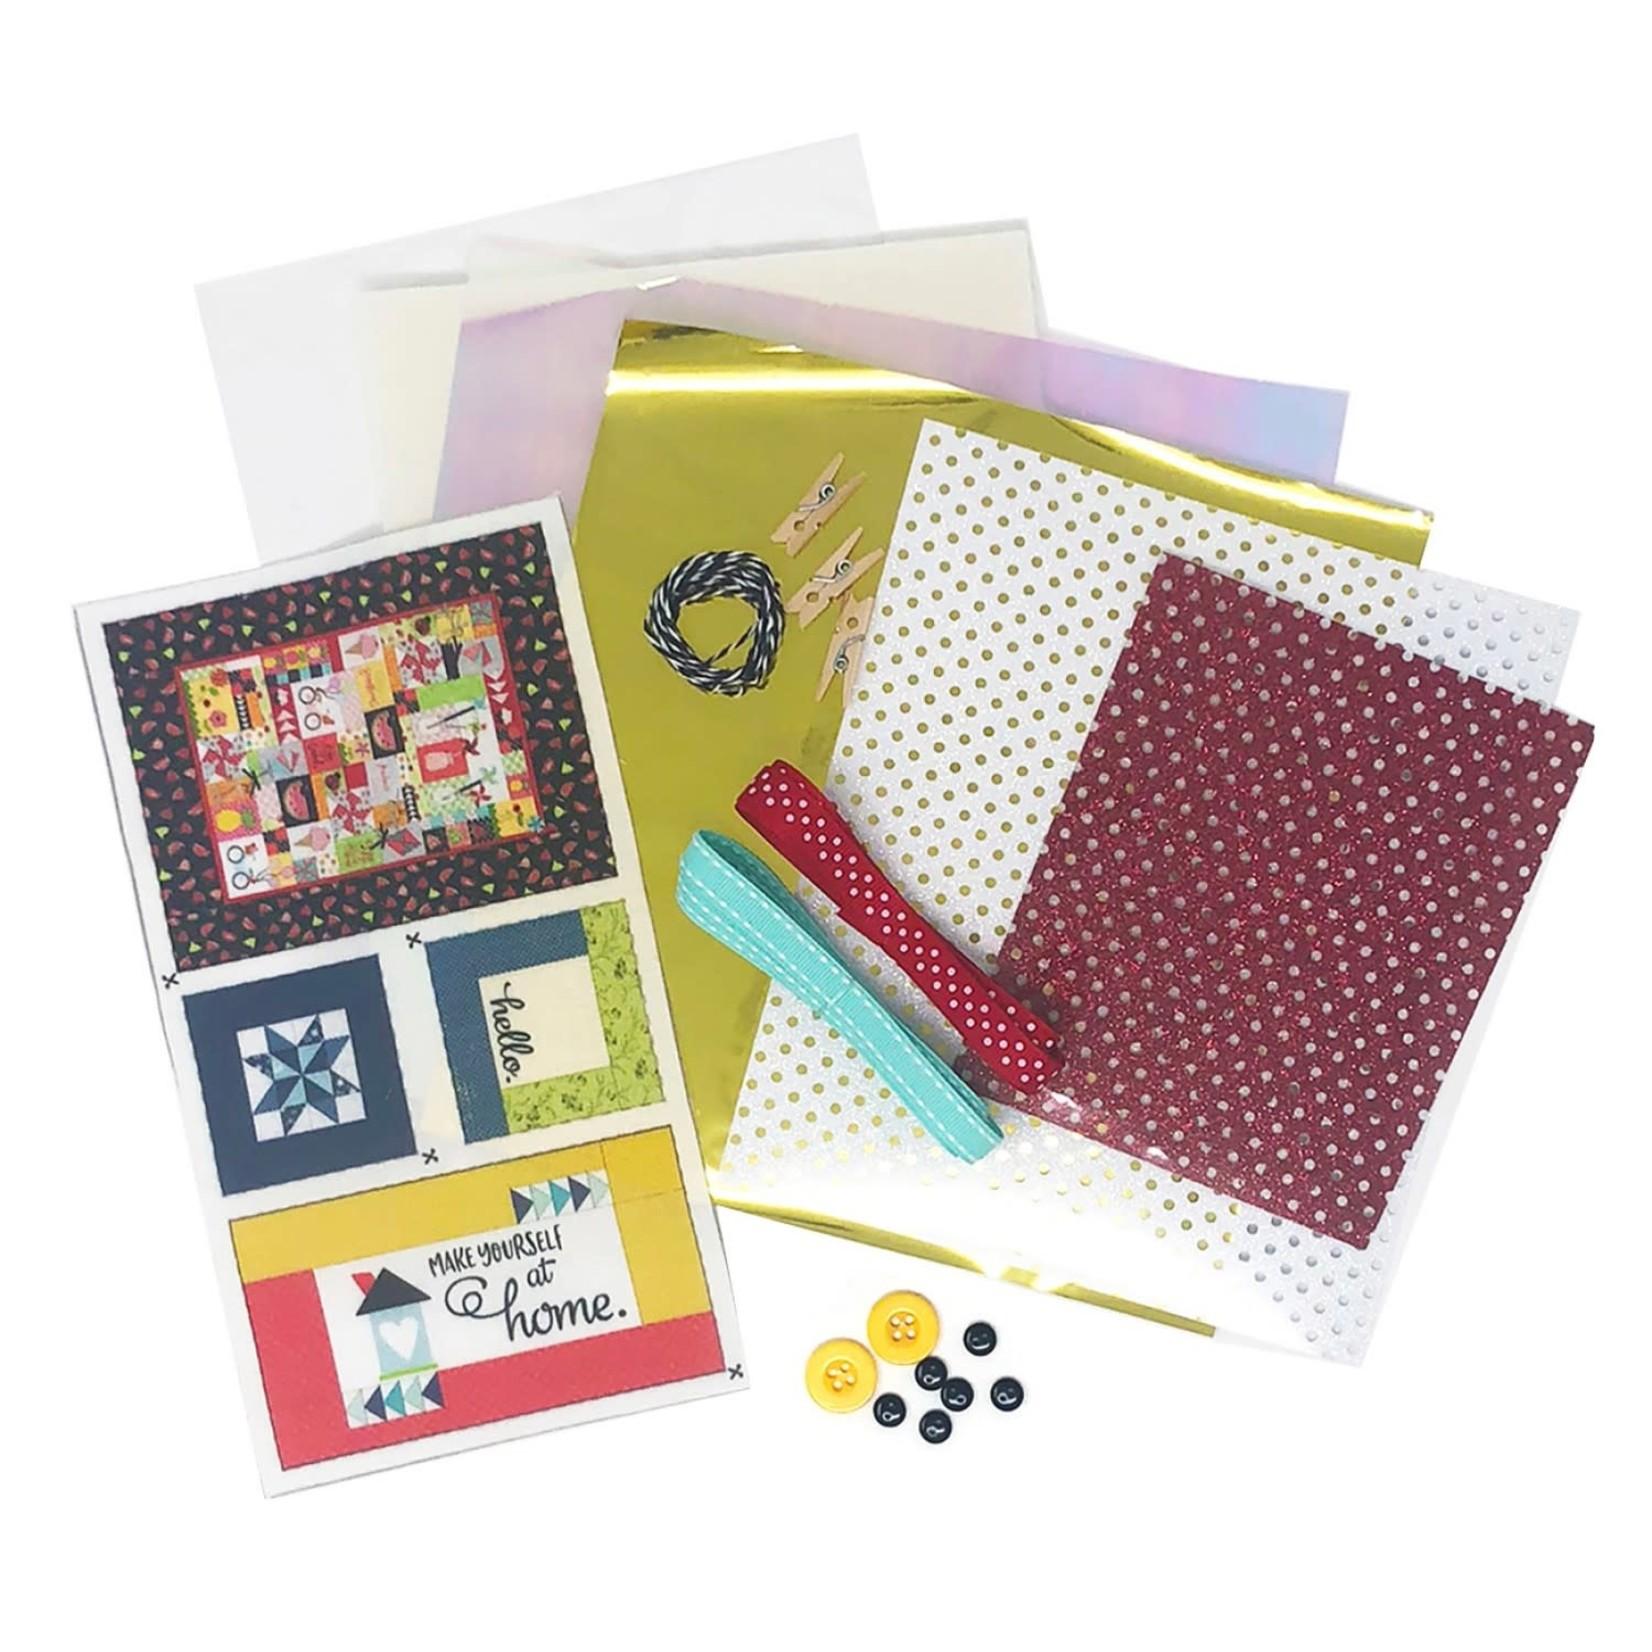 KIMBERBELL DESIGNS Make Yourself at Home Embellishment Kit